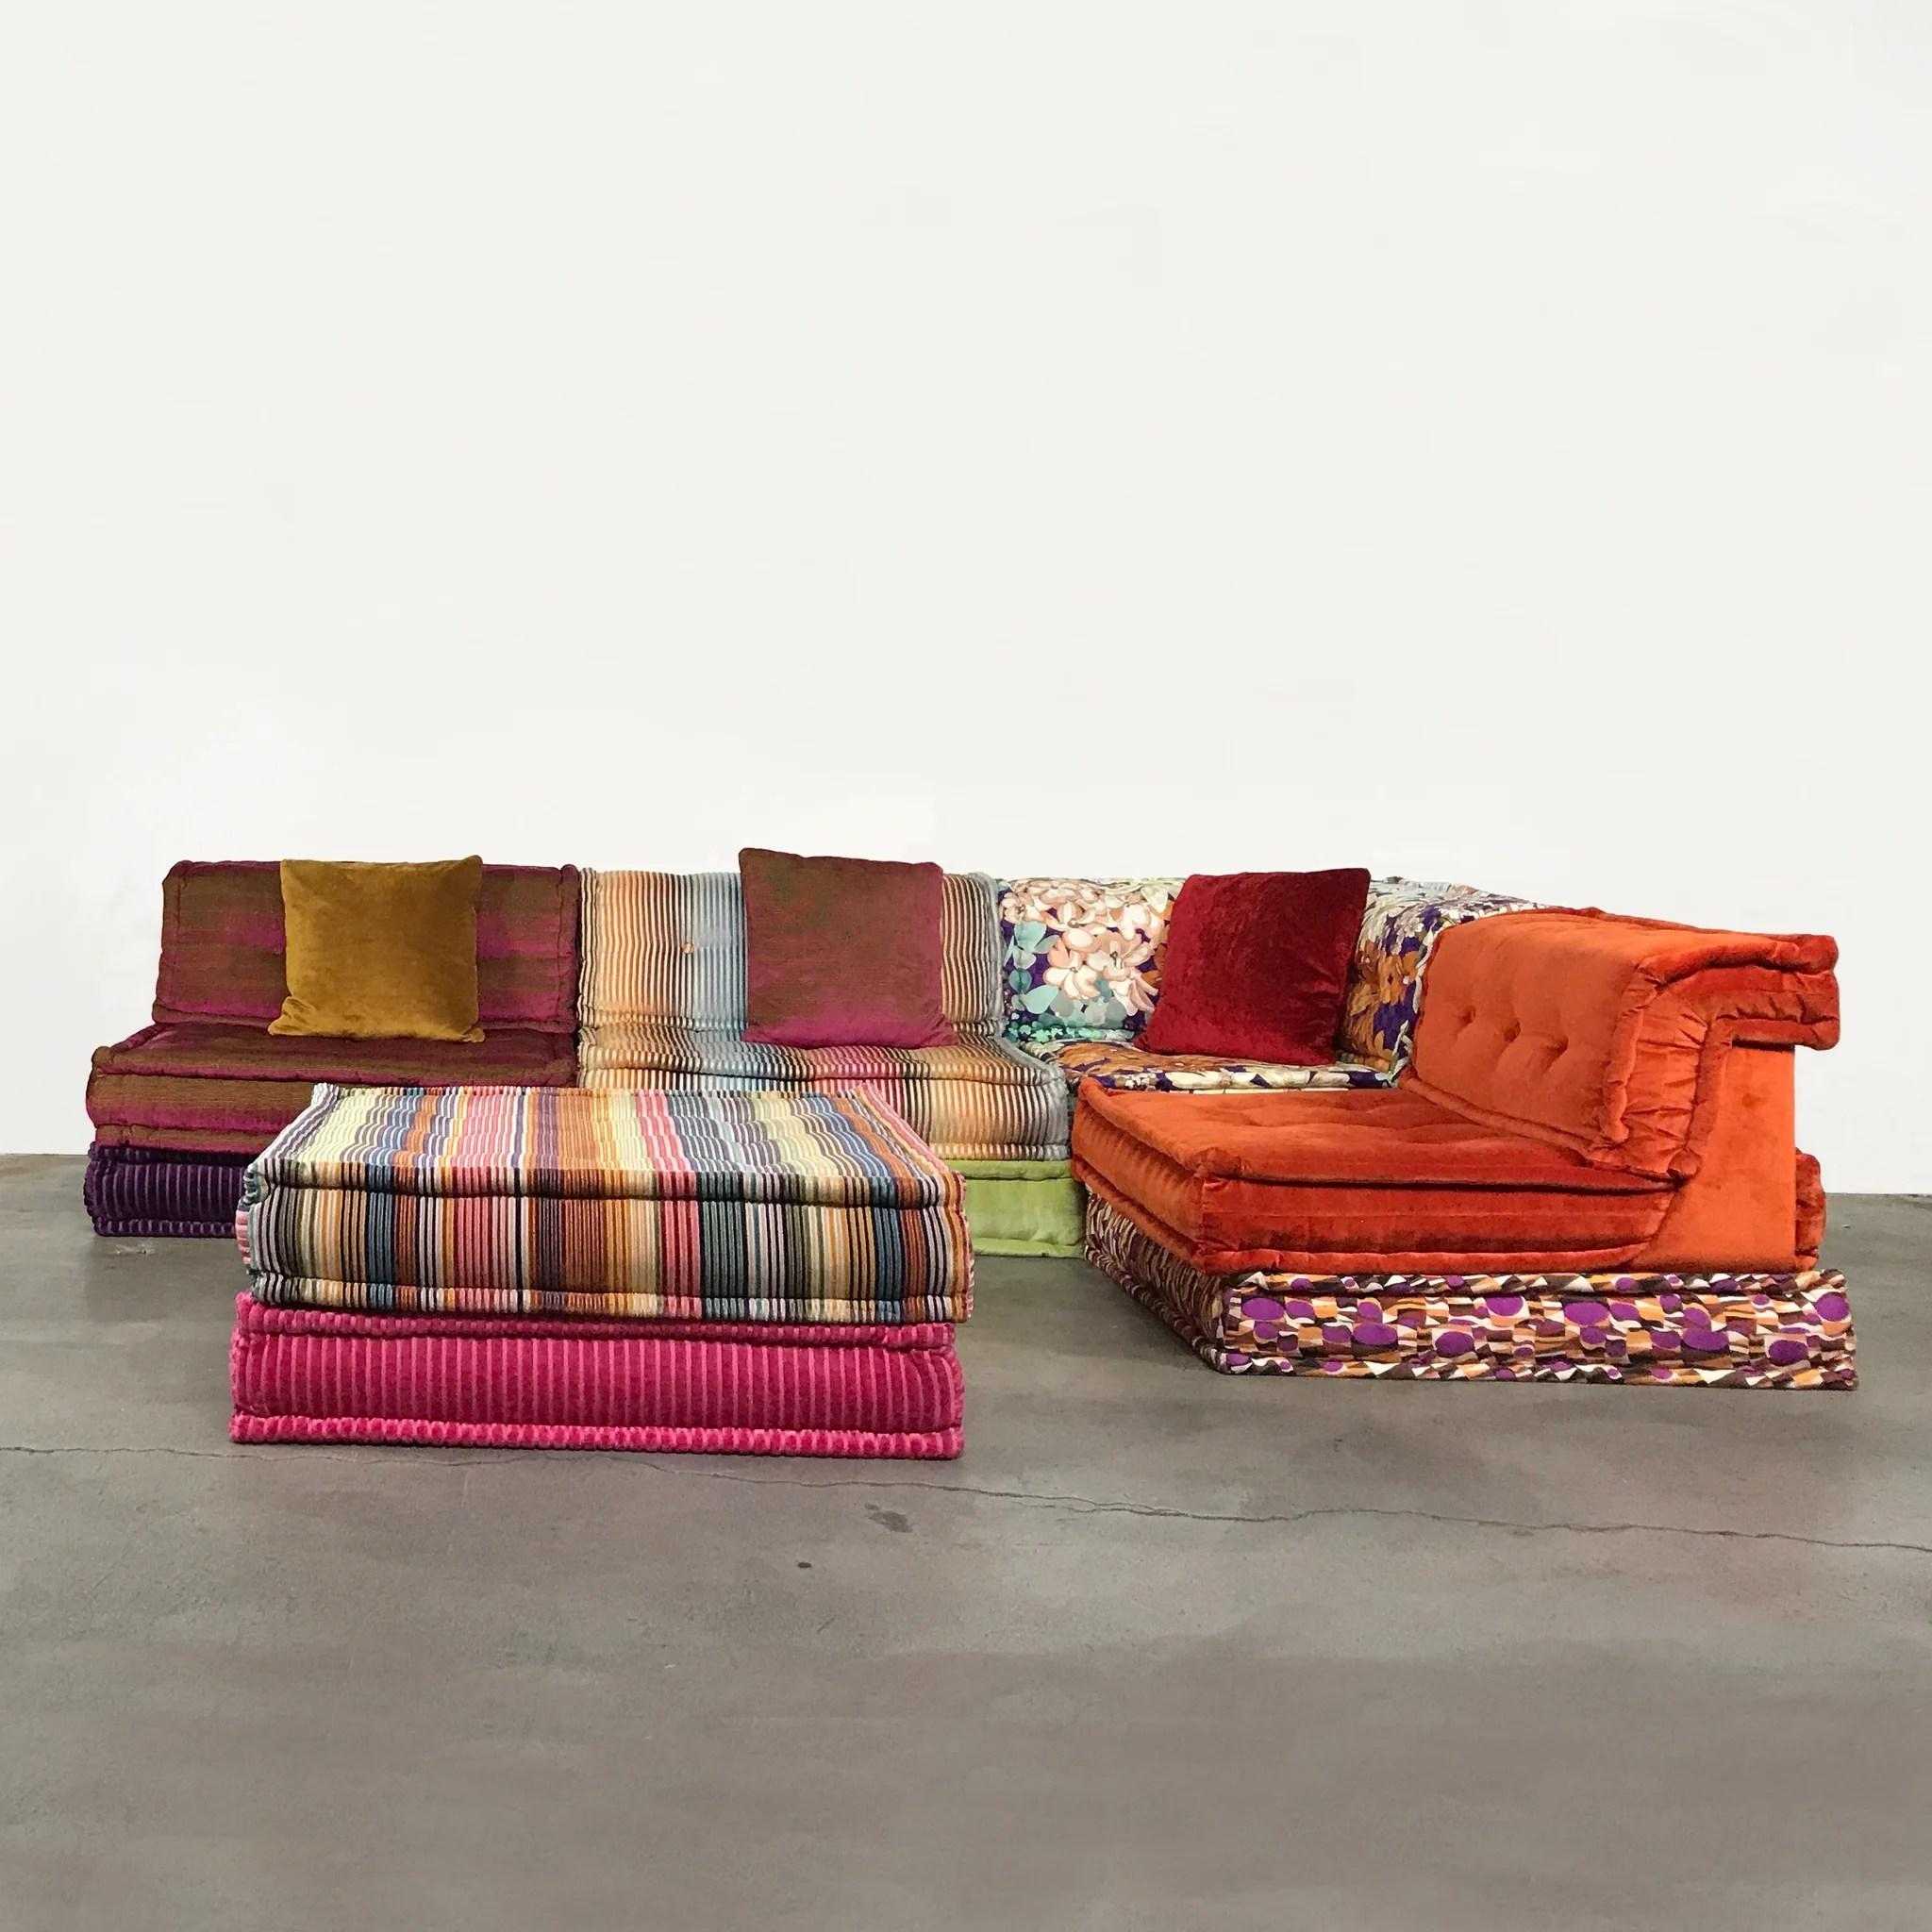 bubble sofa sacha lakic modern sectional sofas for sale roche beaubois best design